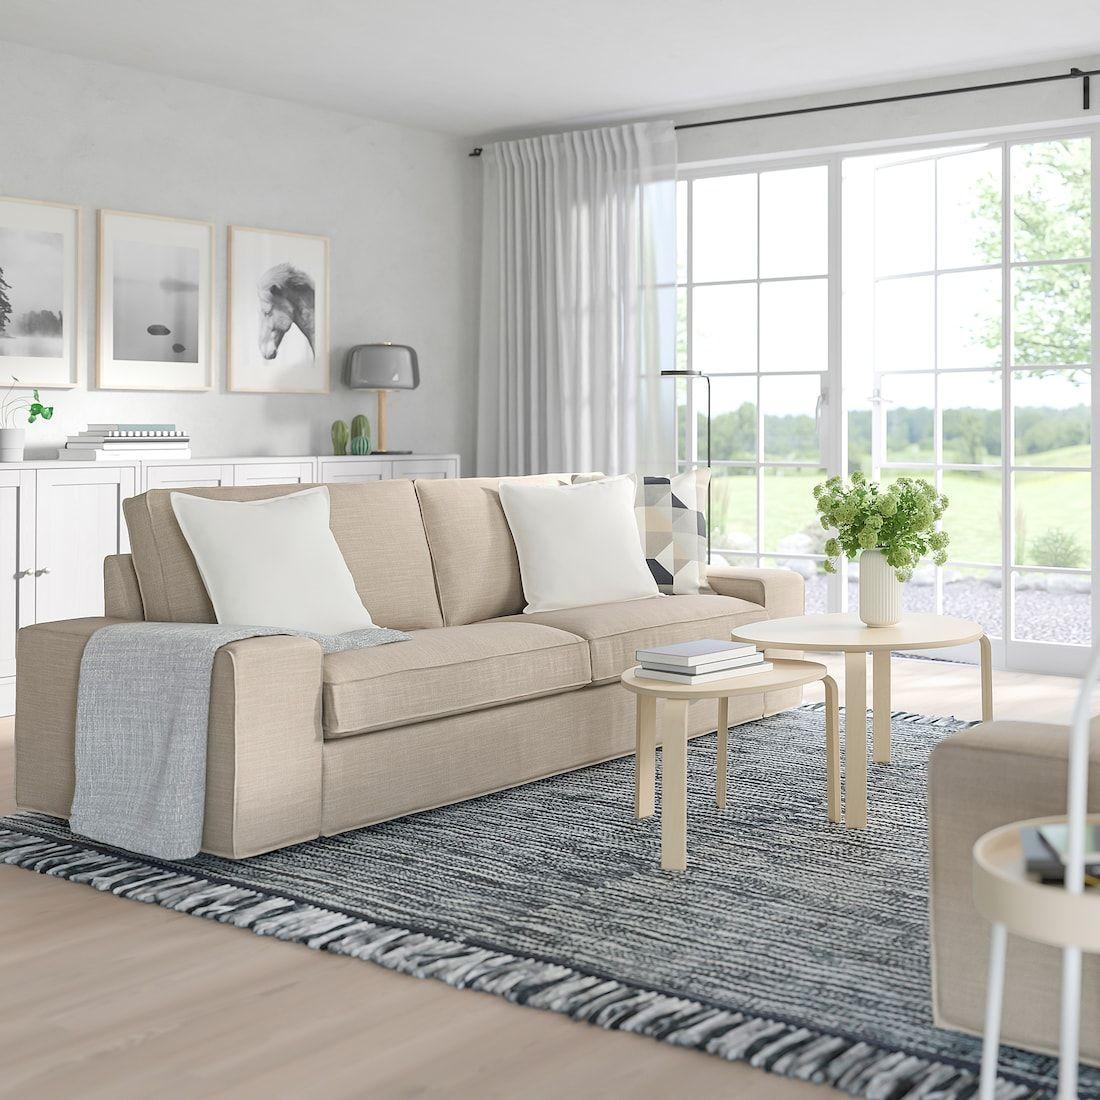 Design Kivik Sofa Living Room Ideas